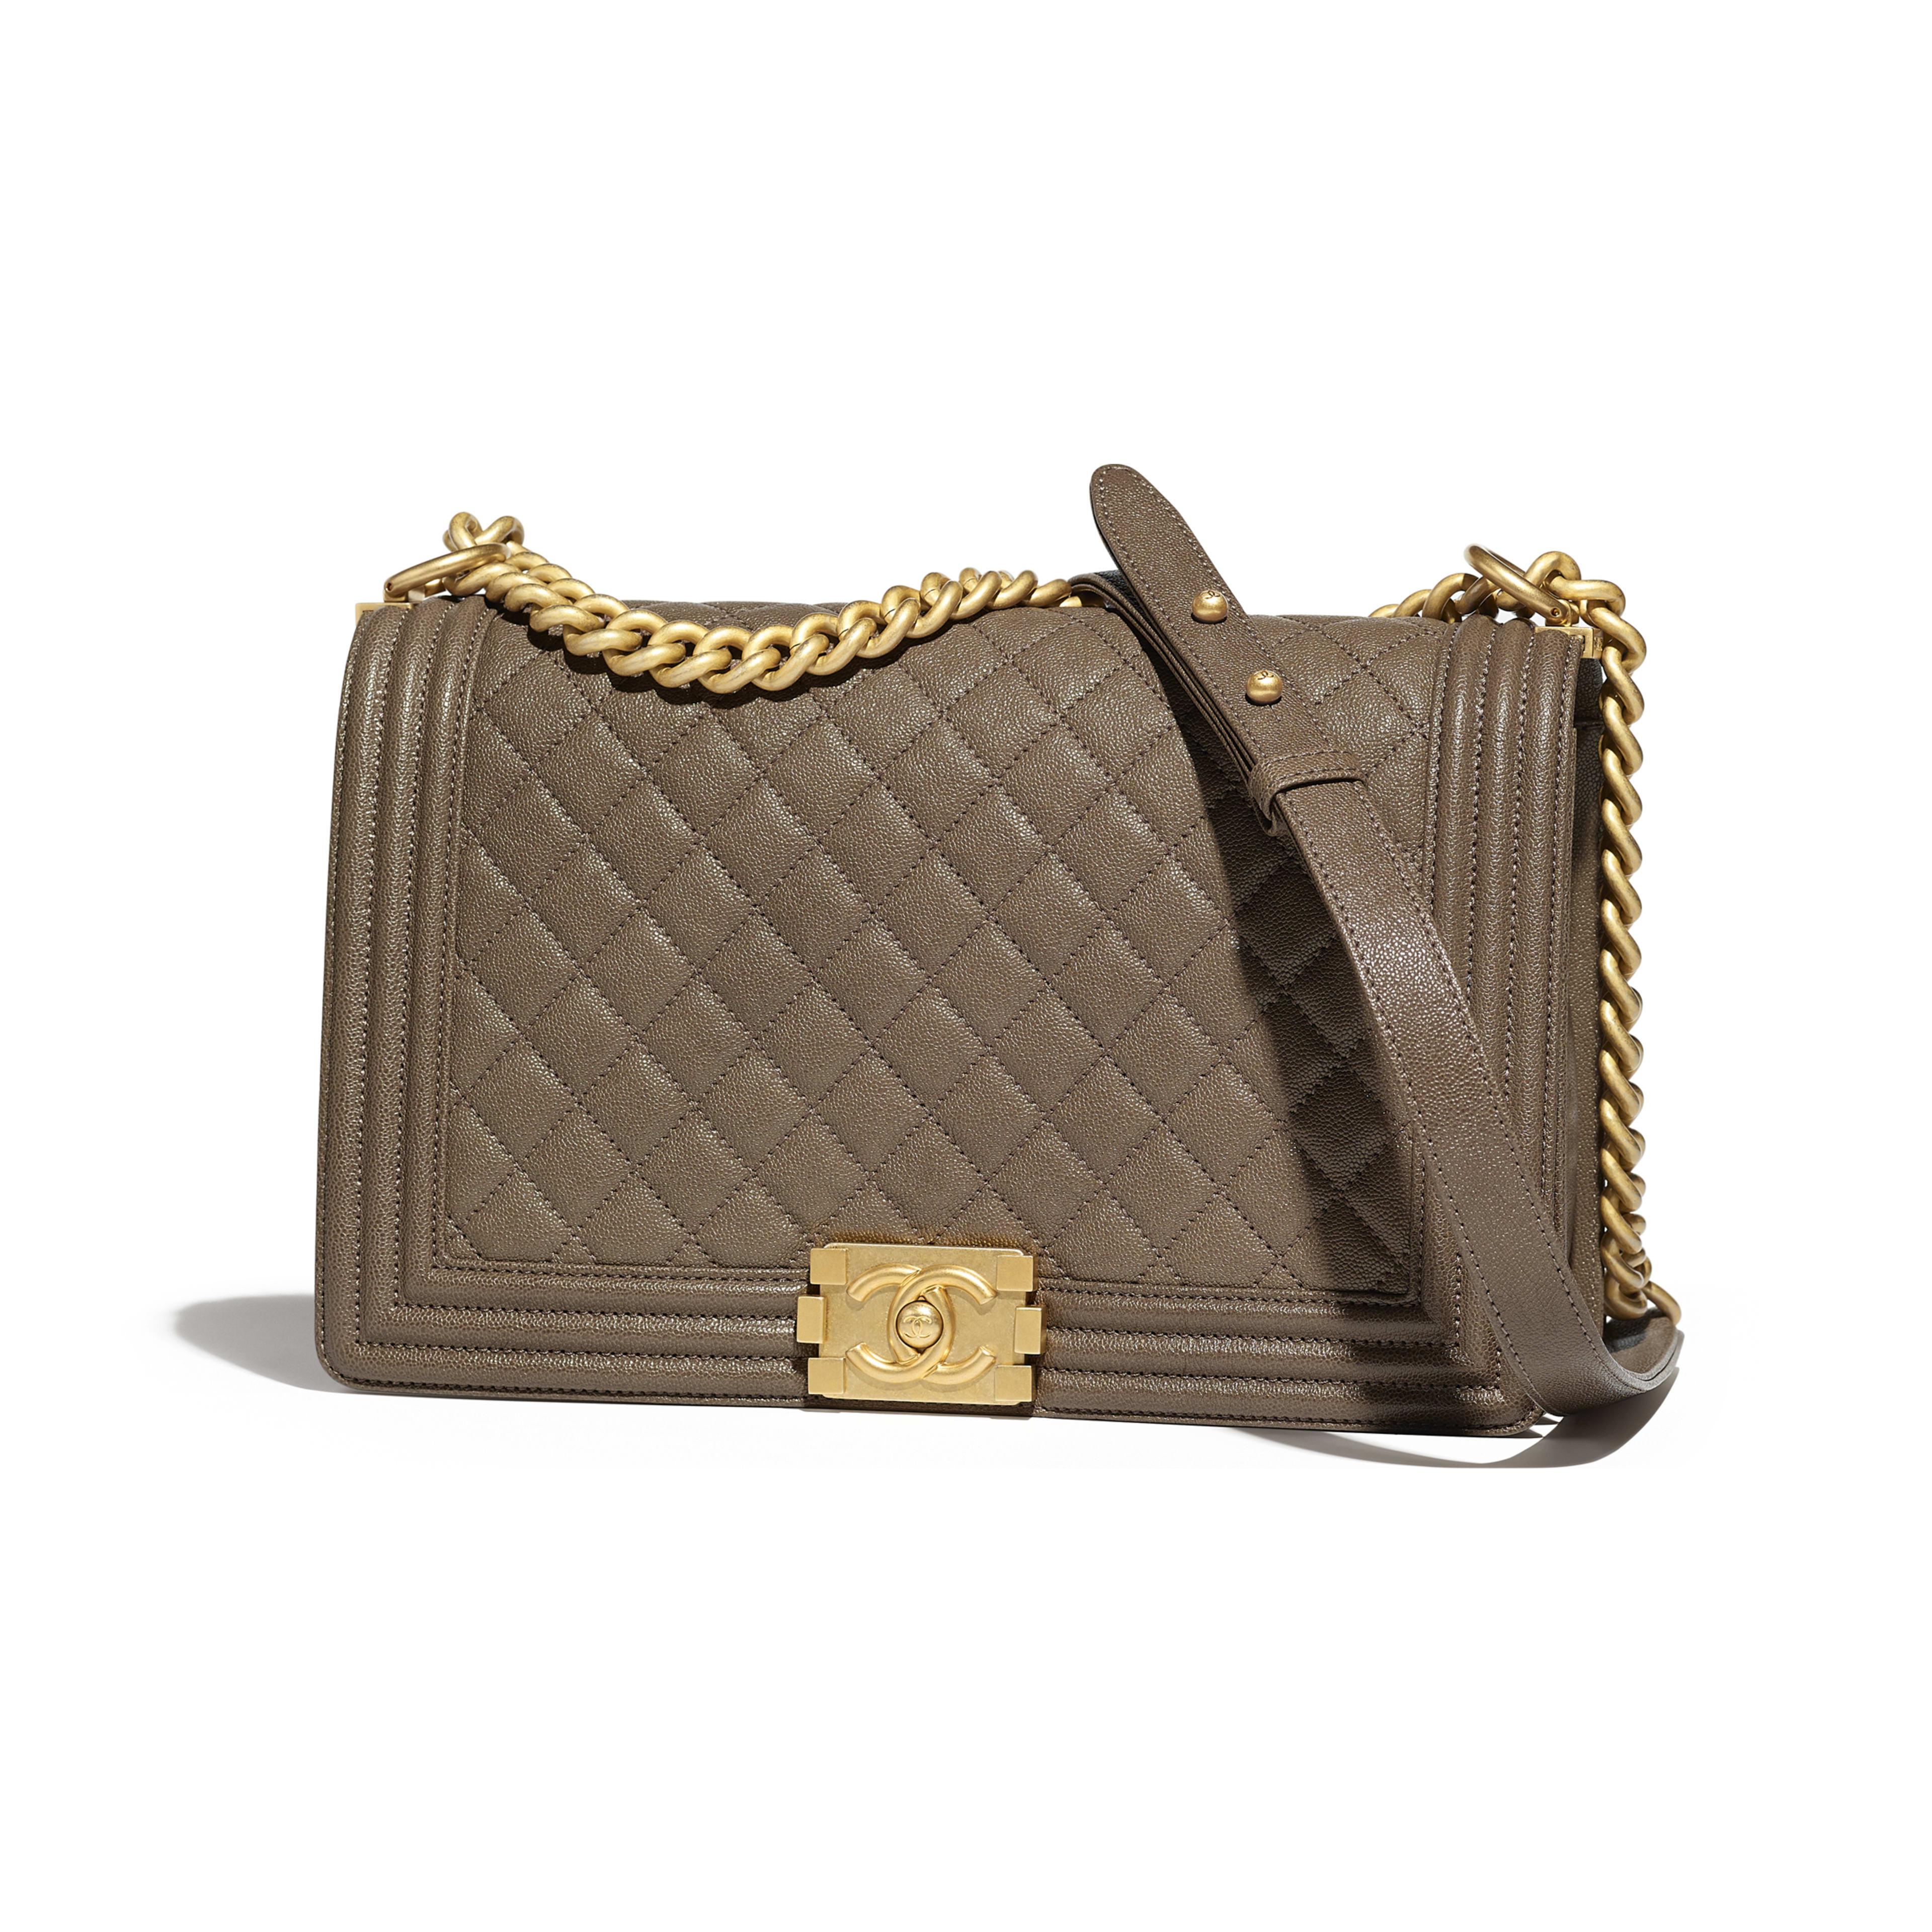 Large BOY CHANEL Handbag Grained Calfskin & Gold-Tone Metal Khaki -                                  view 1 - see full sized version